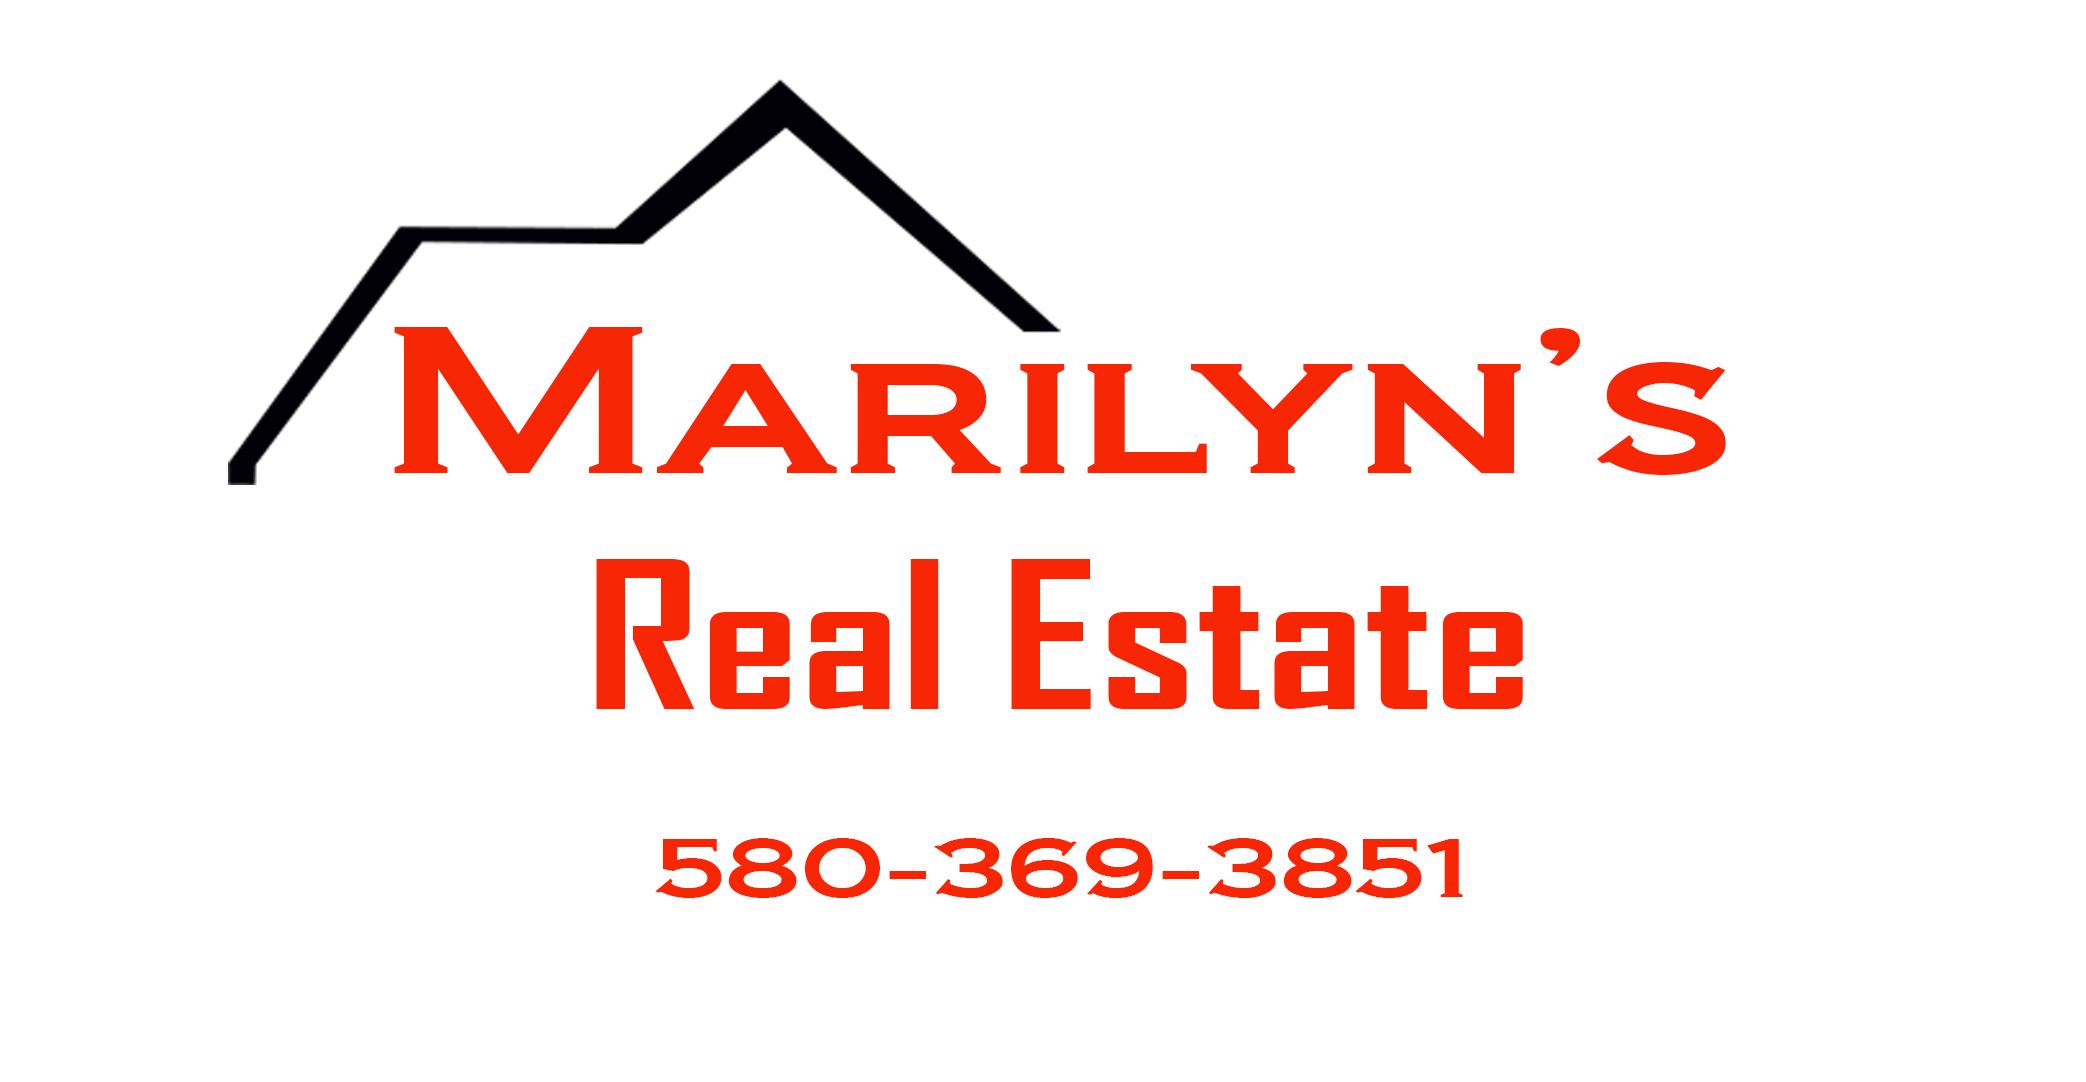 Marilyn's Real Estate.jpg